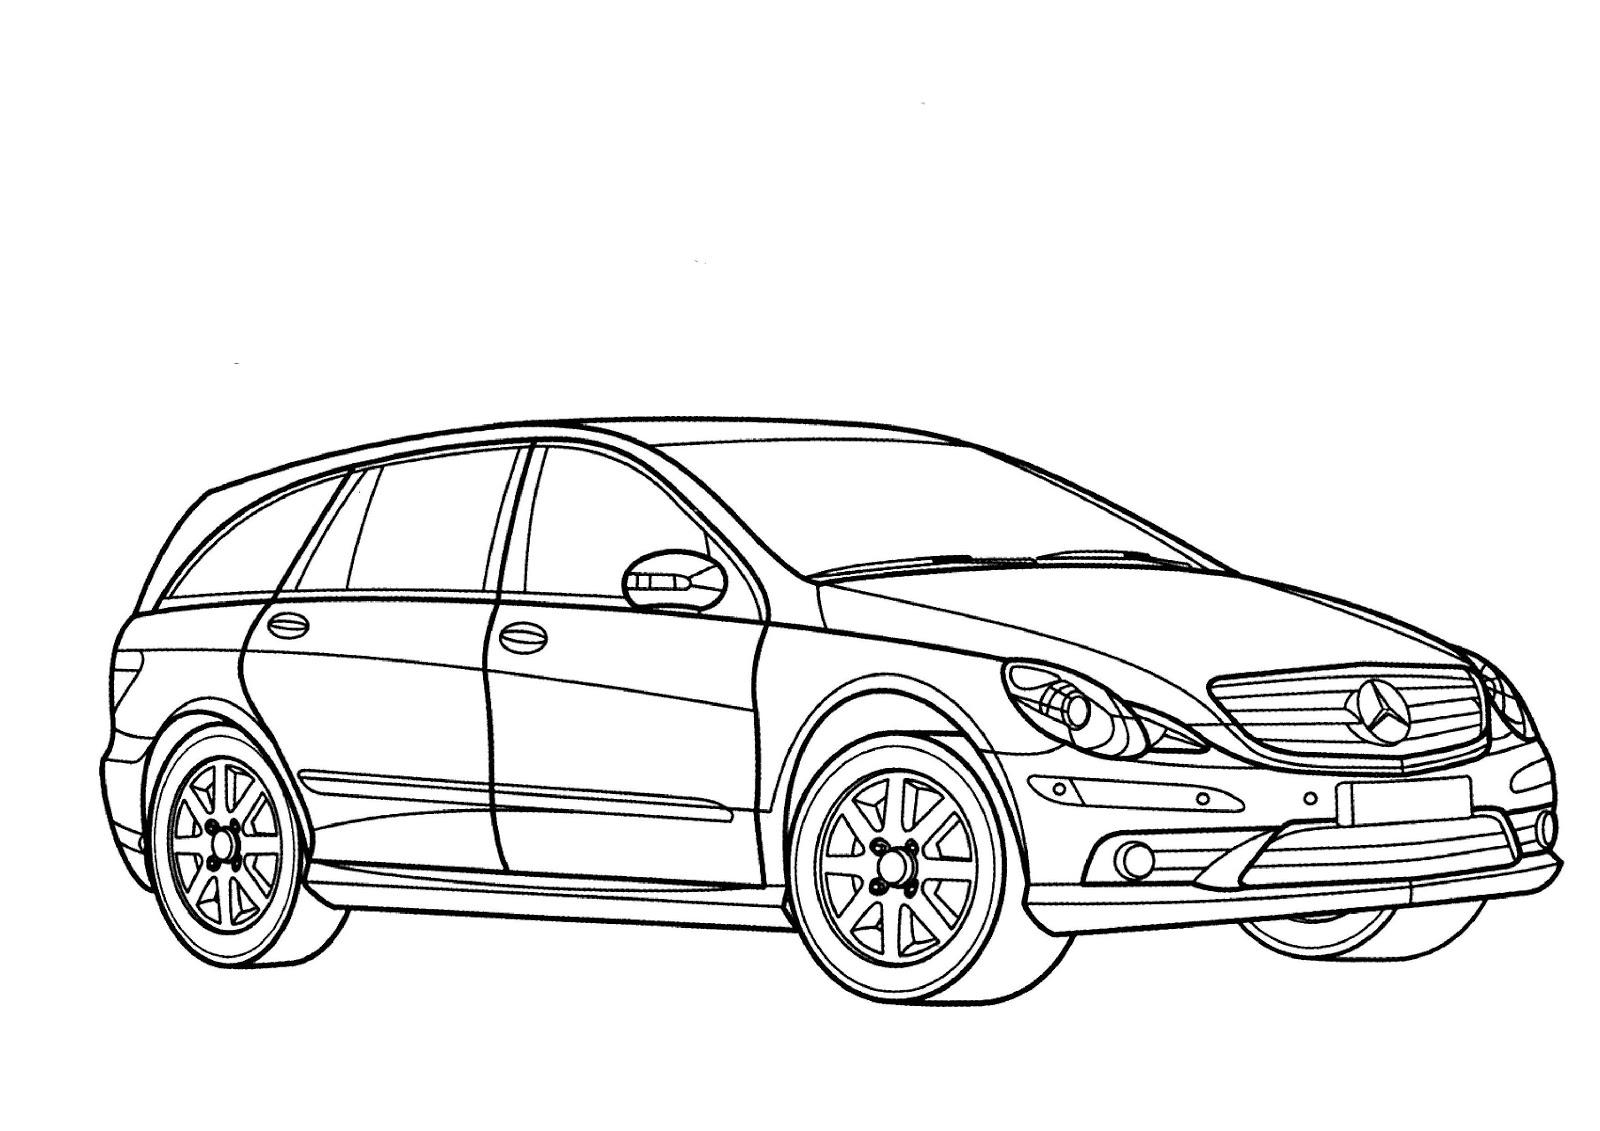 Dibujos Para Imprimir De Coches Mercedes